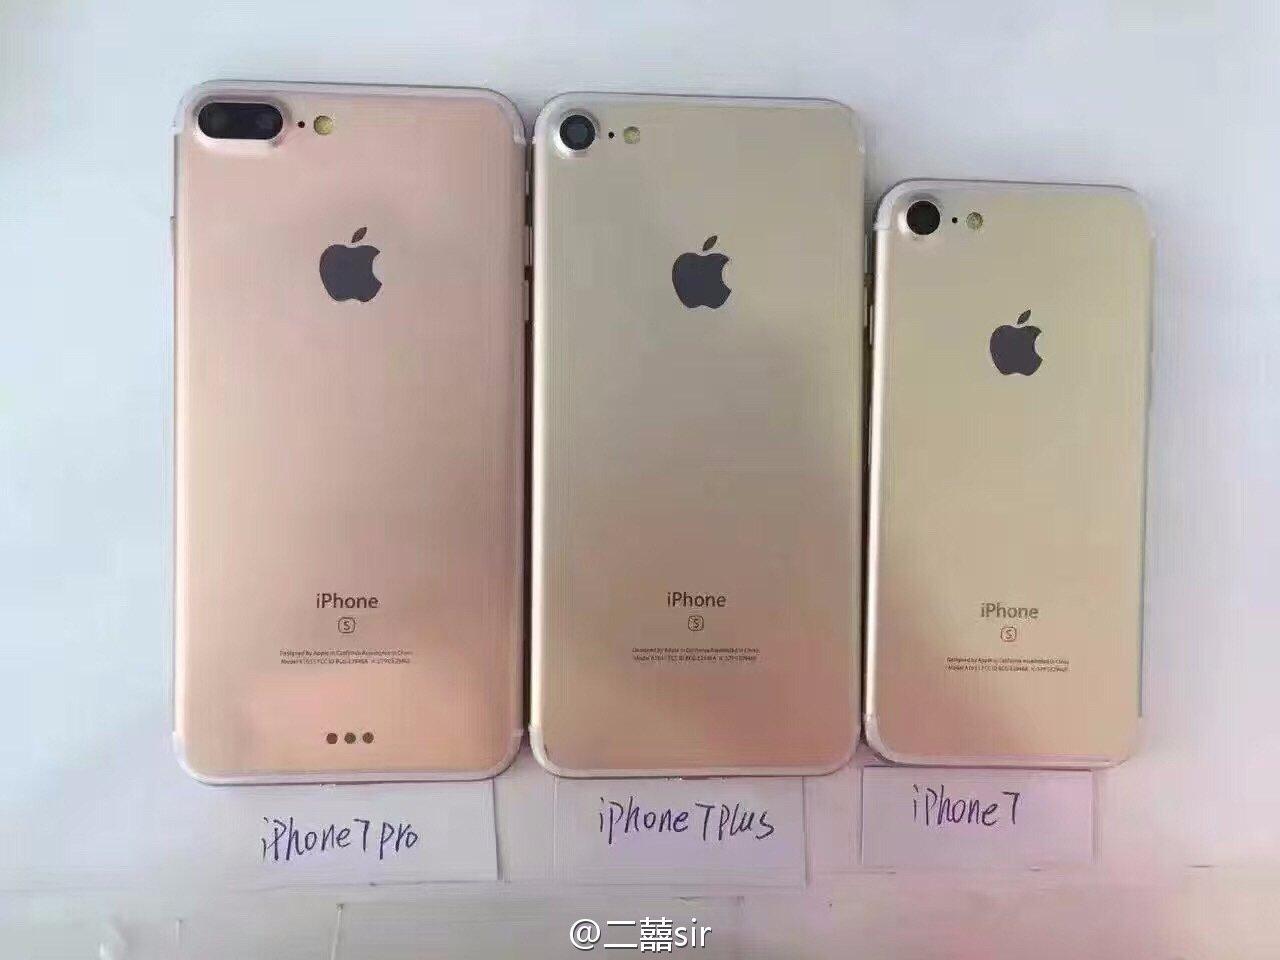 iphone-7-iphone-7-plus-iphone-7-pro-back 600 01